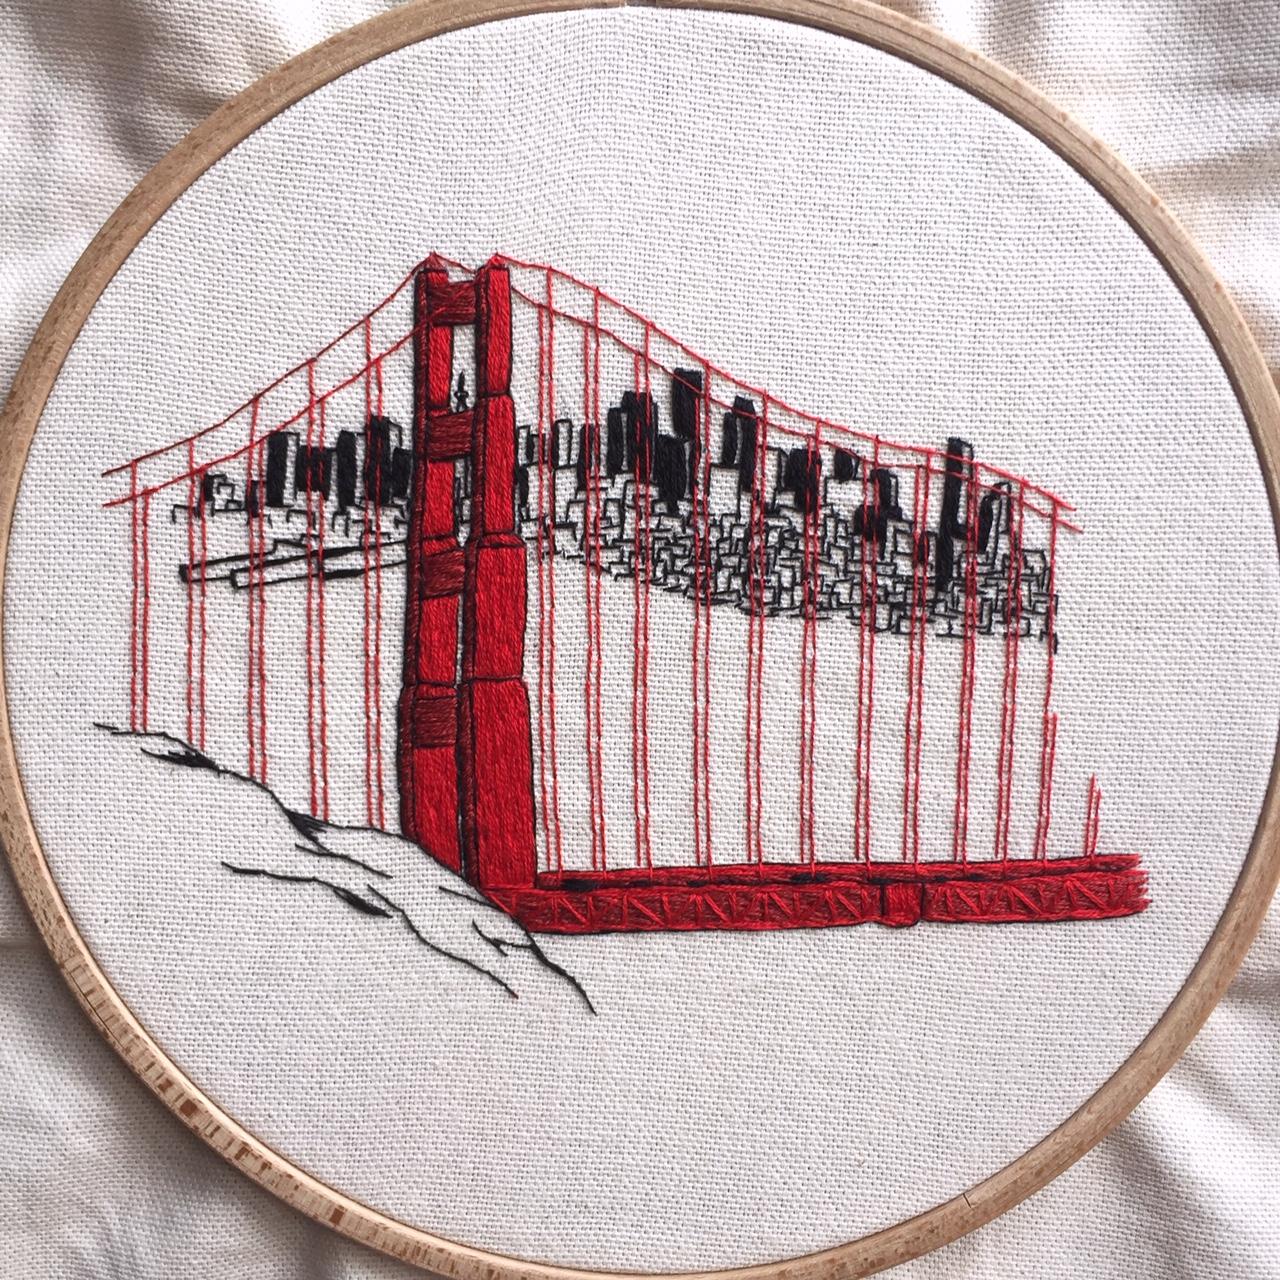 Golden Gate Bridge embroidery pattern